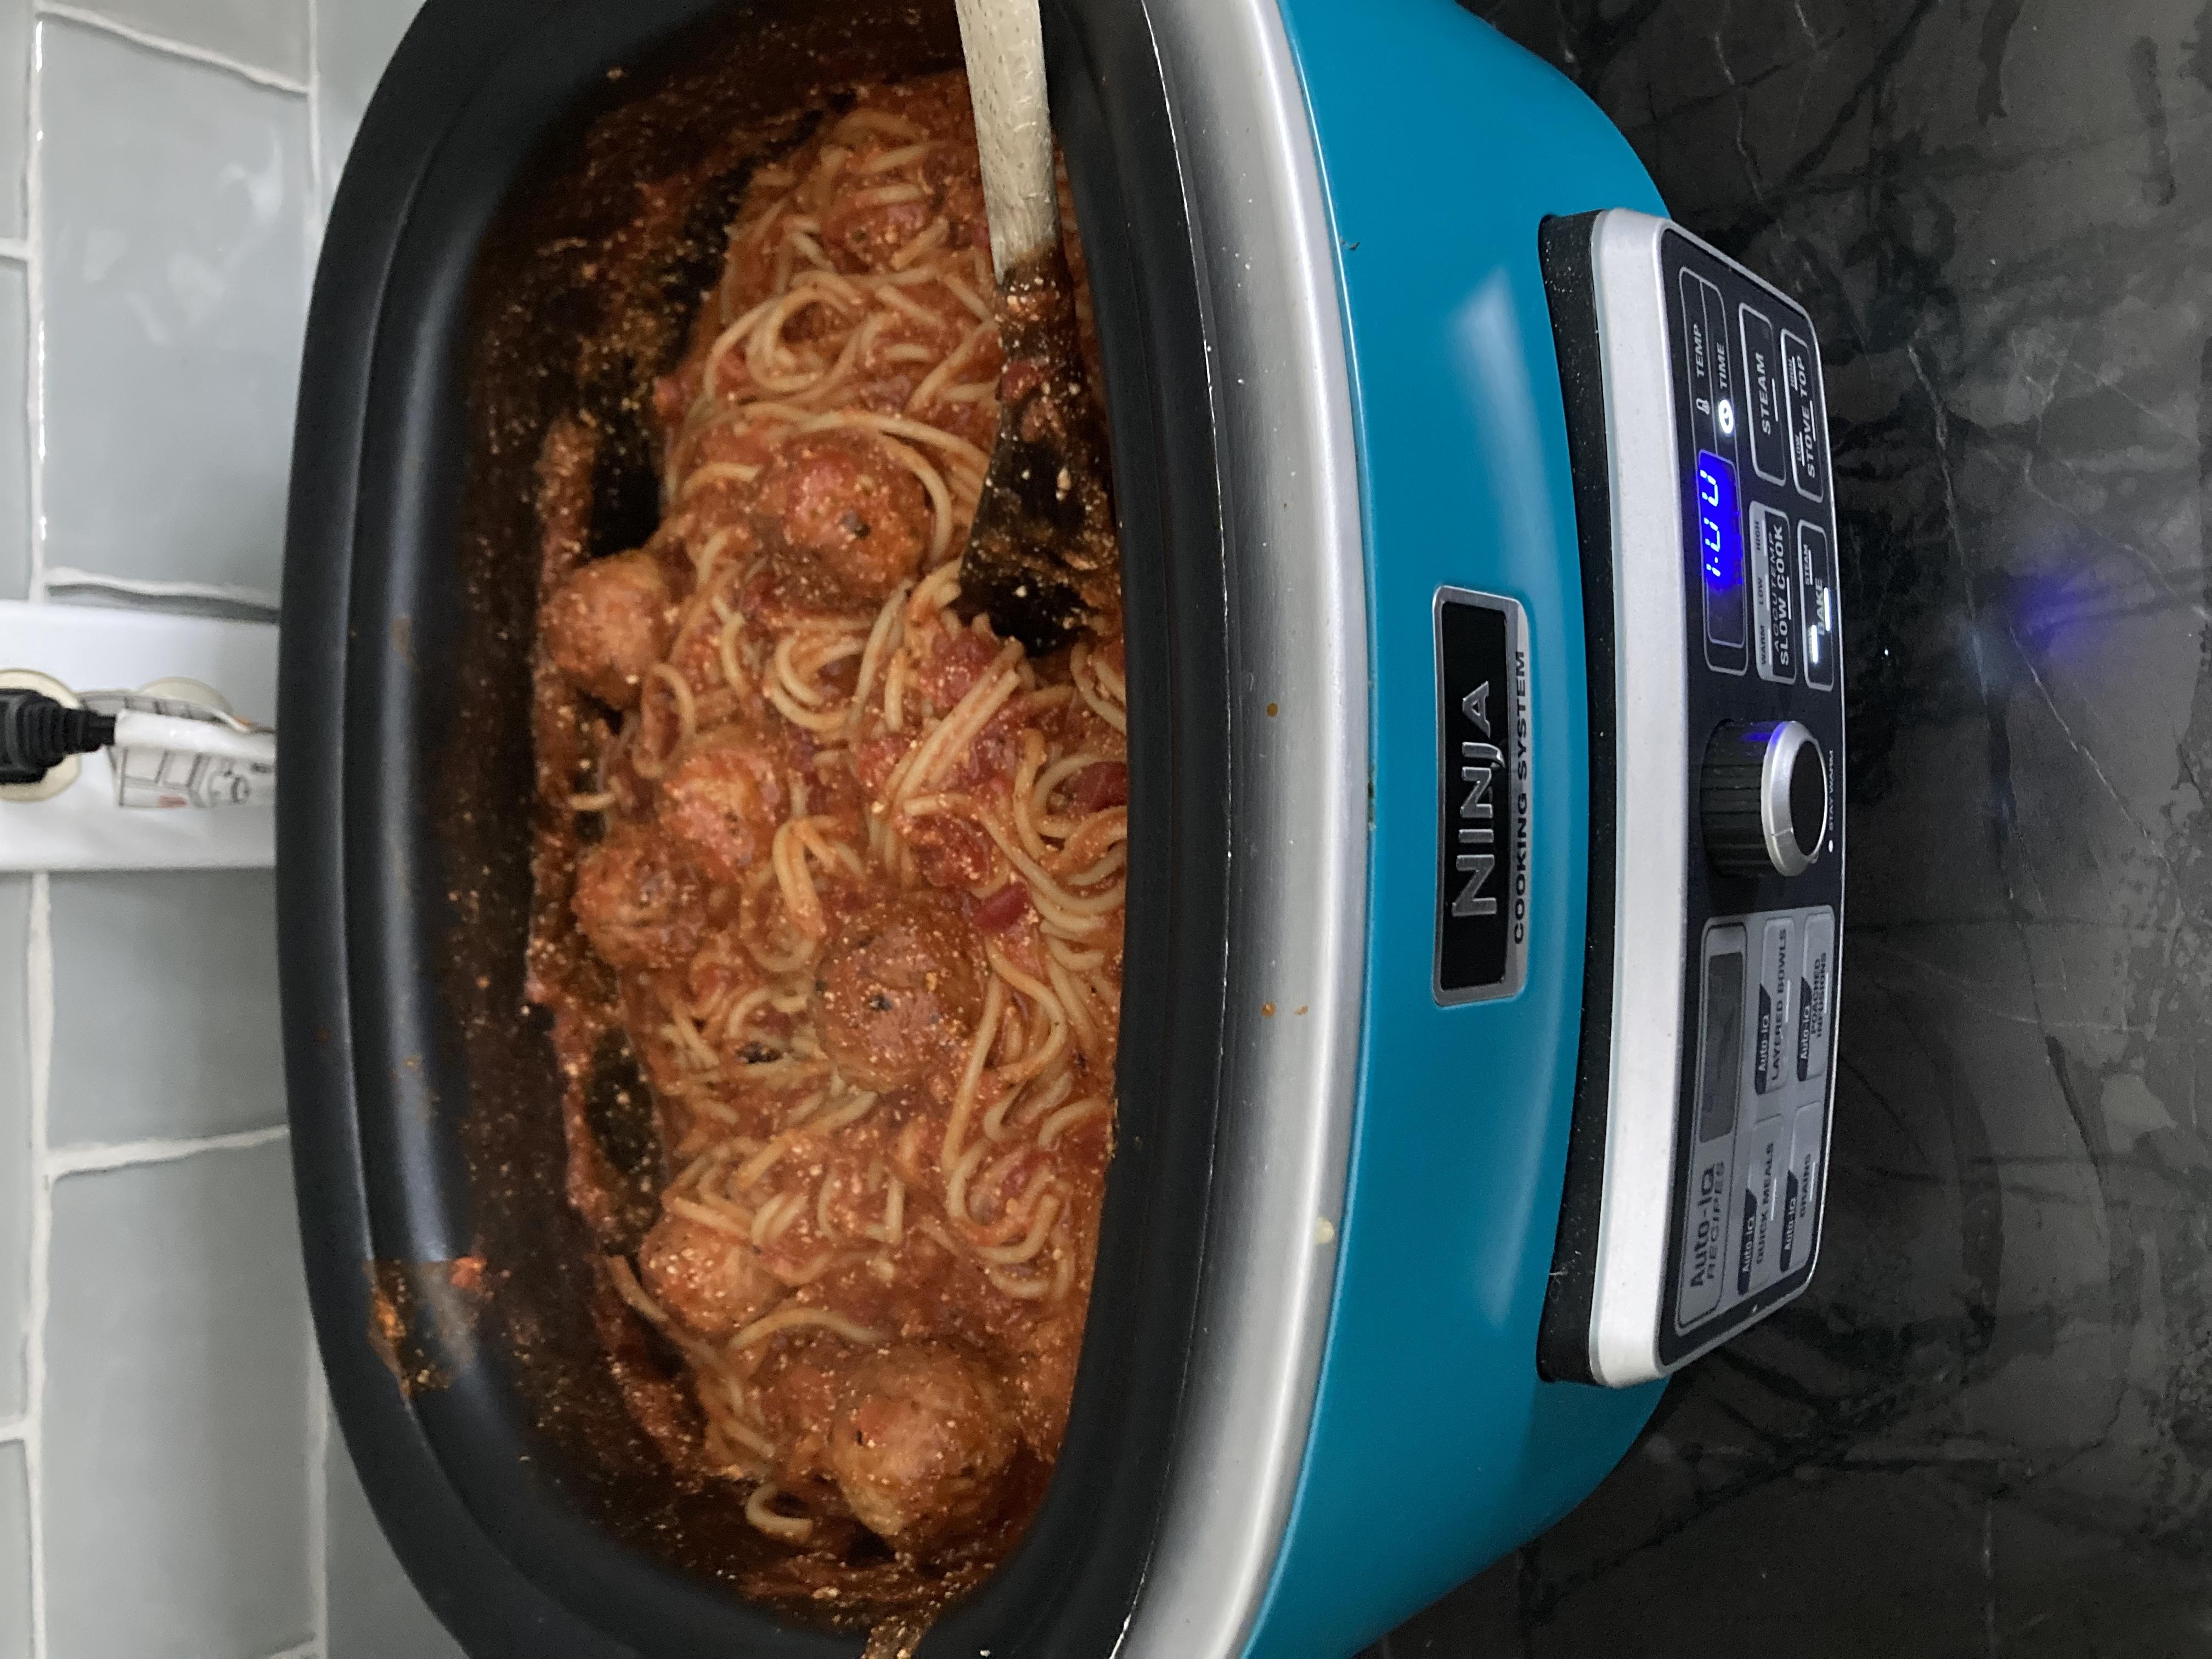 Spaghetti & Meatballs in Ninja Cooking System Recipe